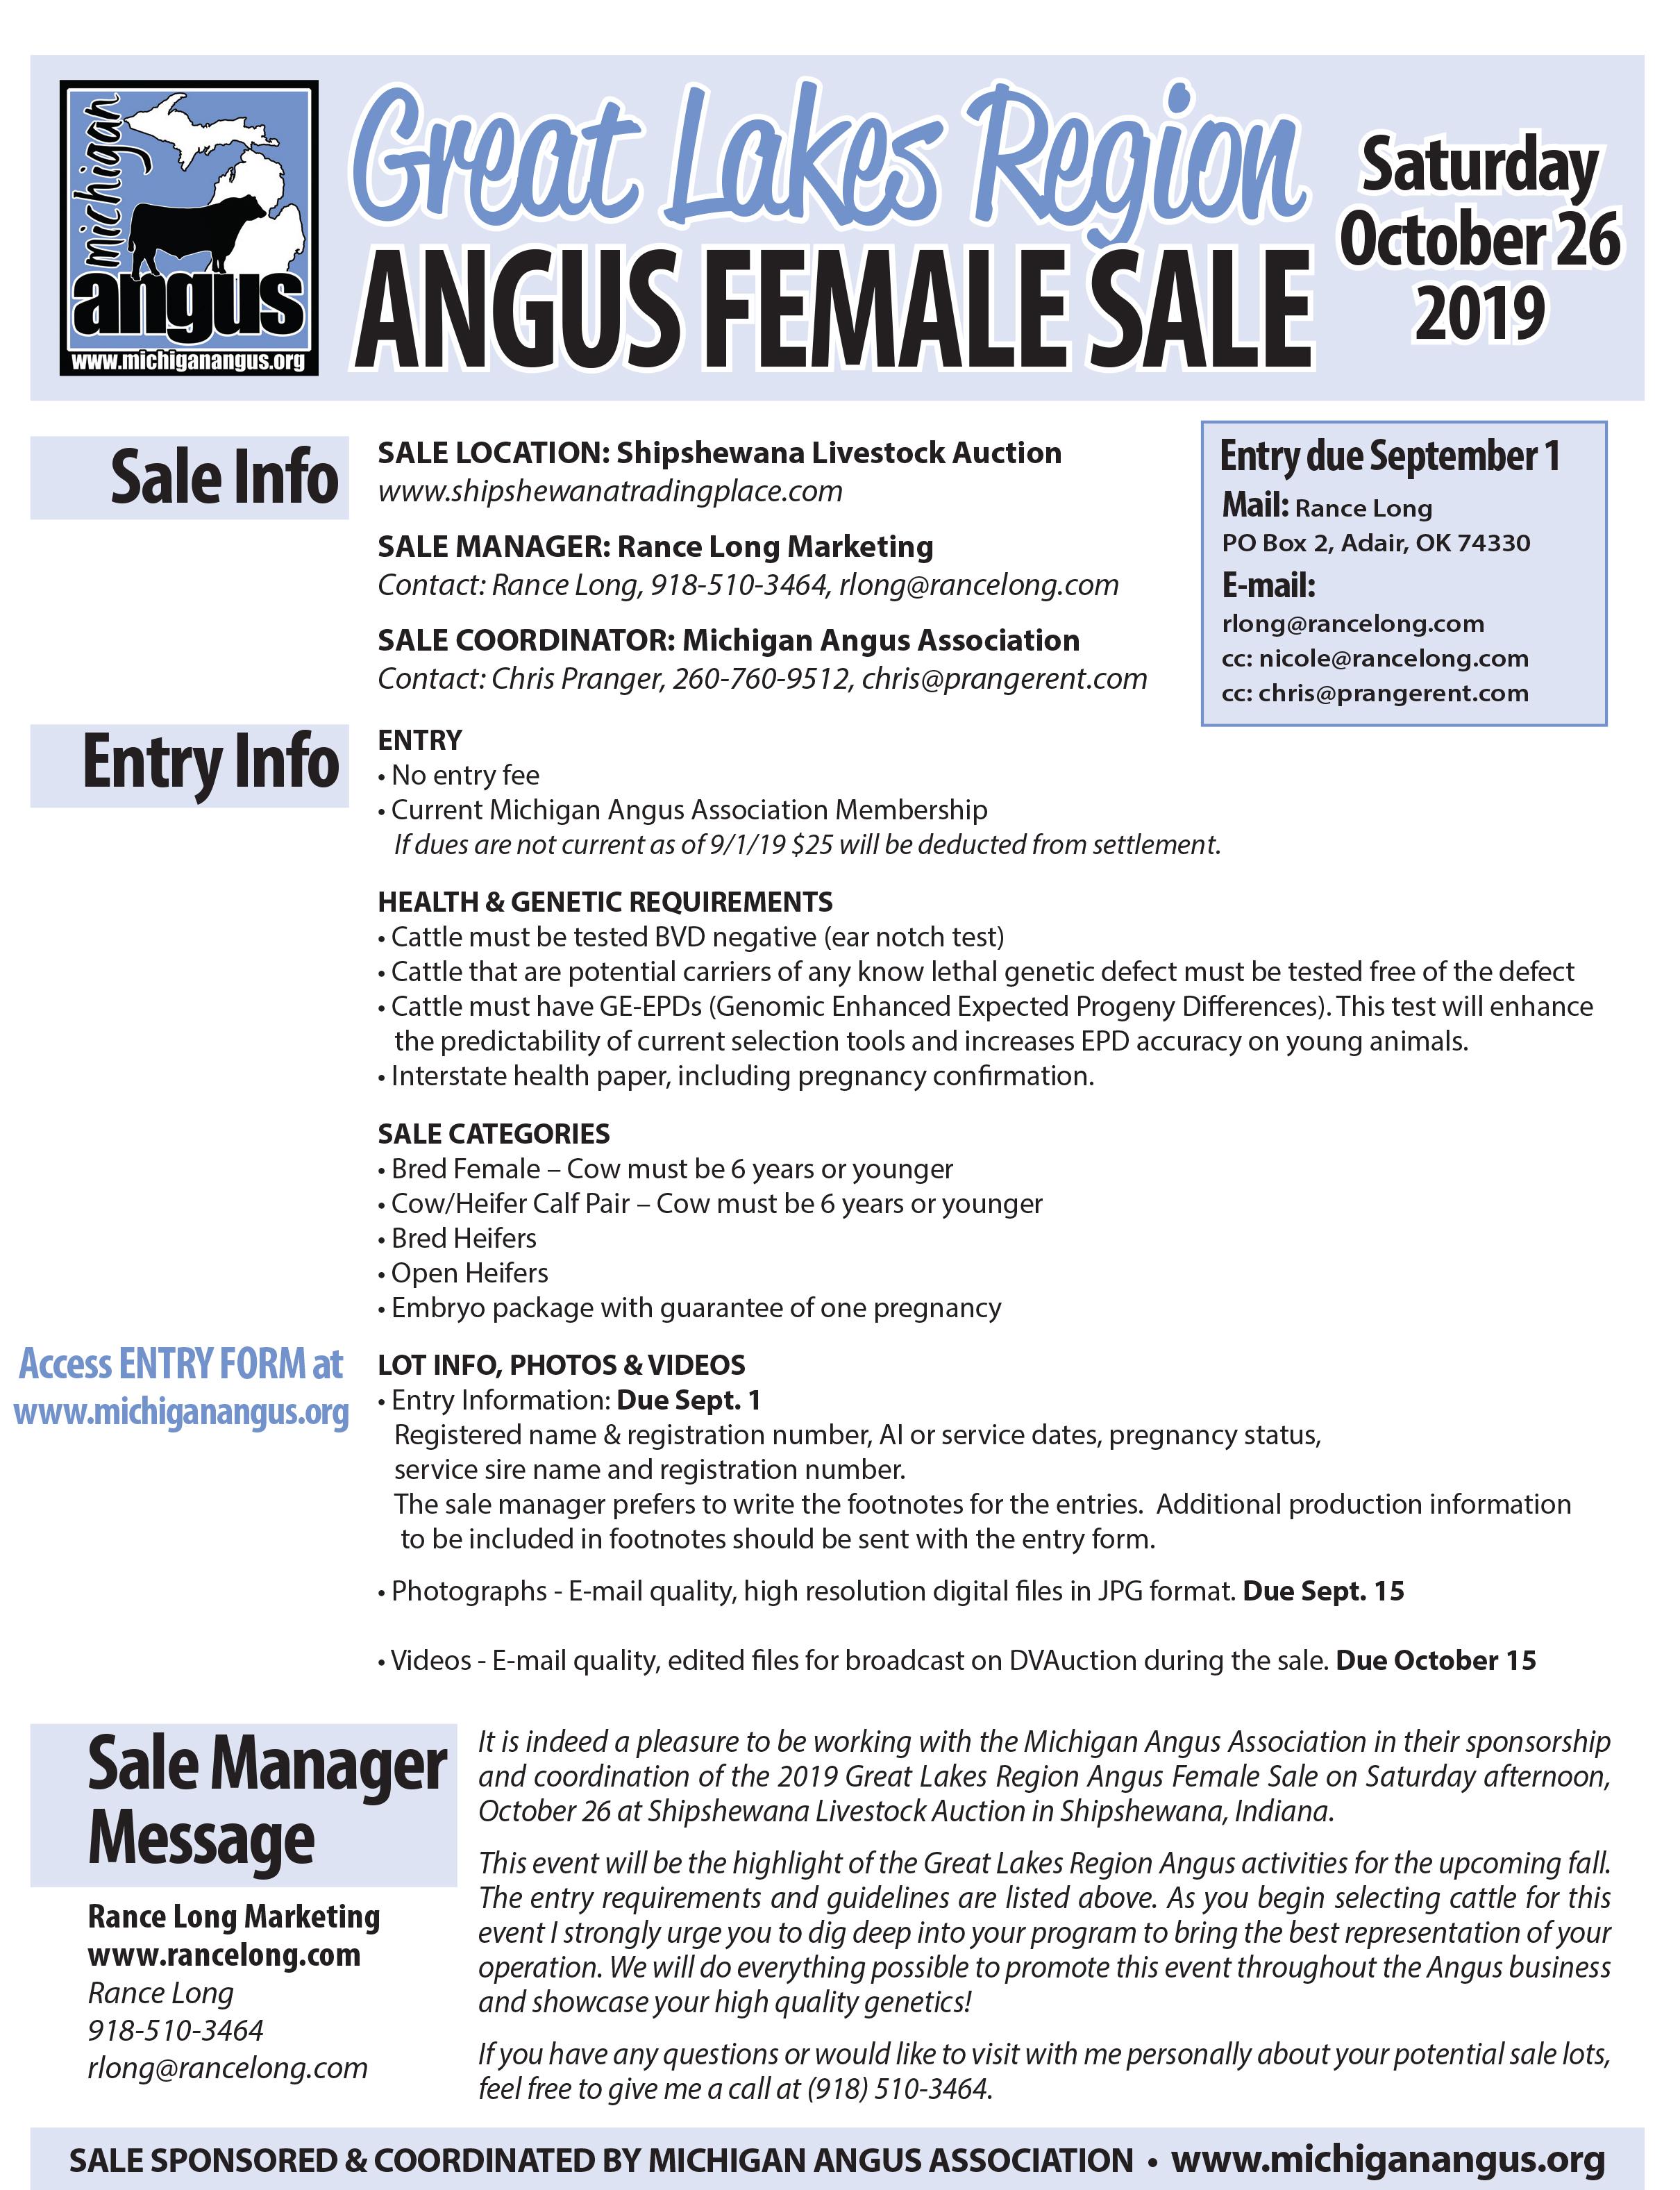 2019 great lakes region angus sale